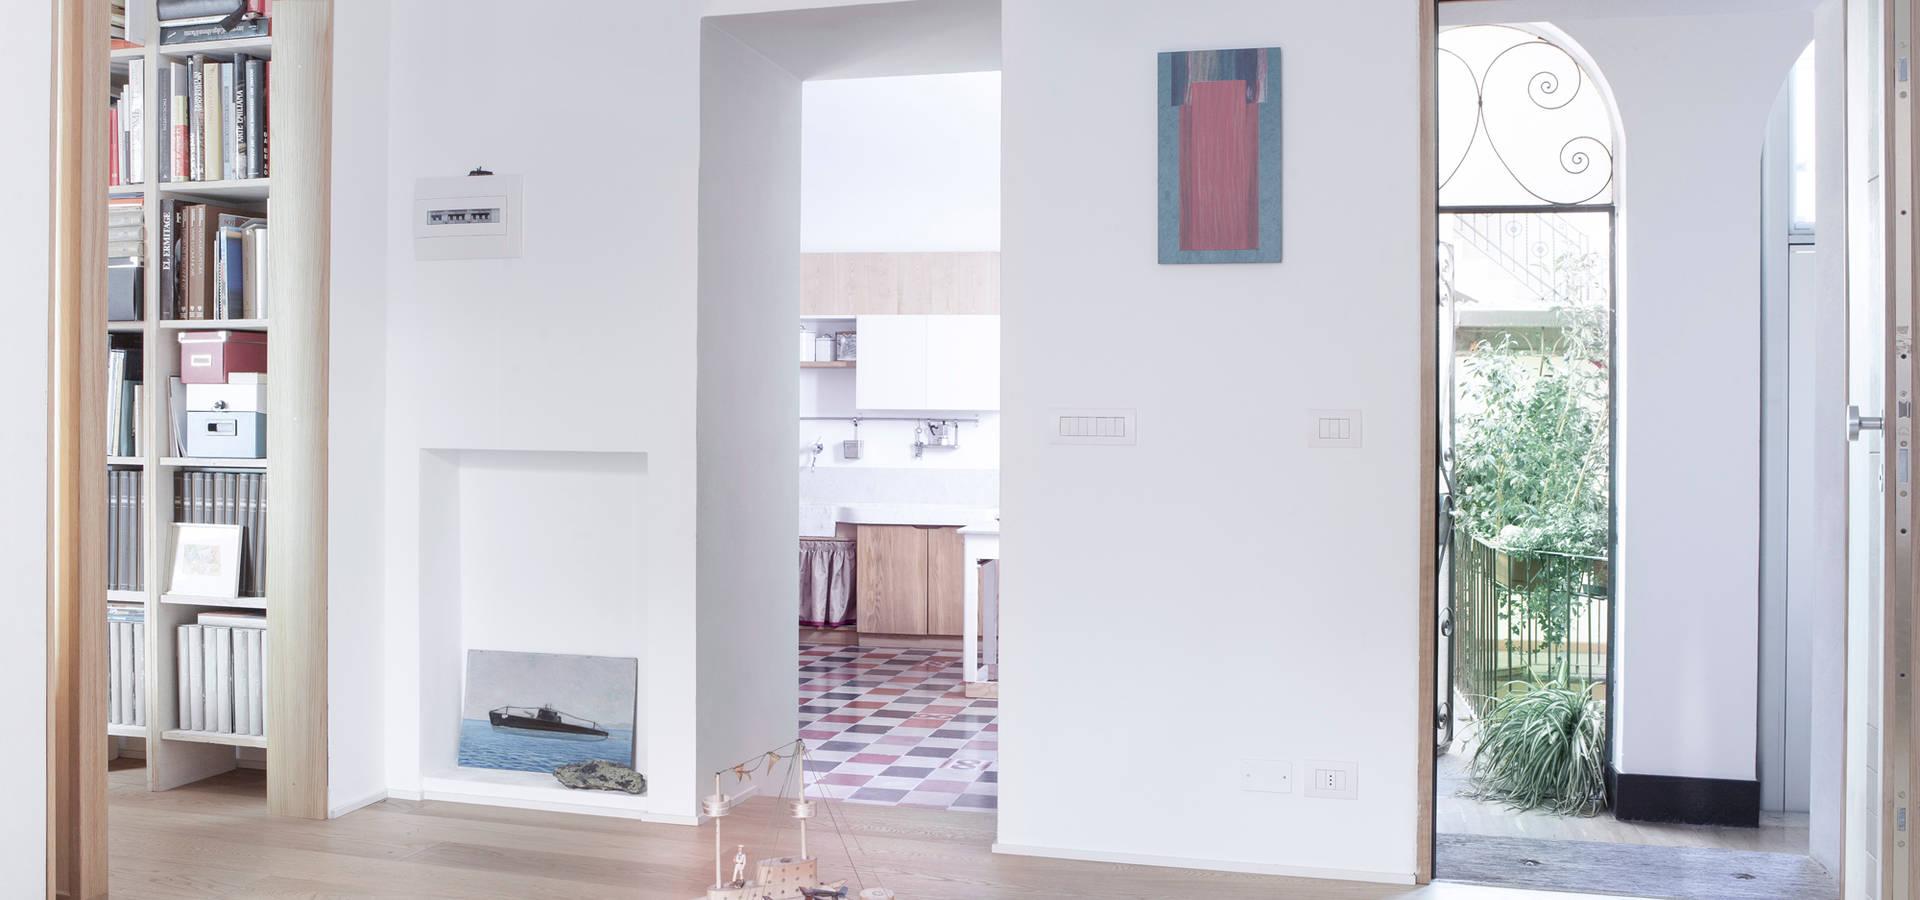 Giovanna Cavalli Architetto